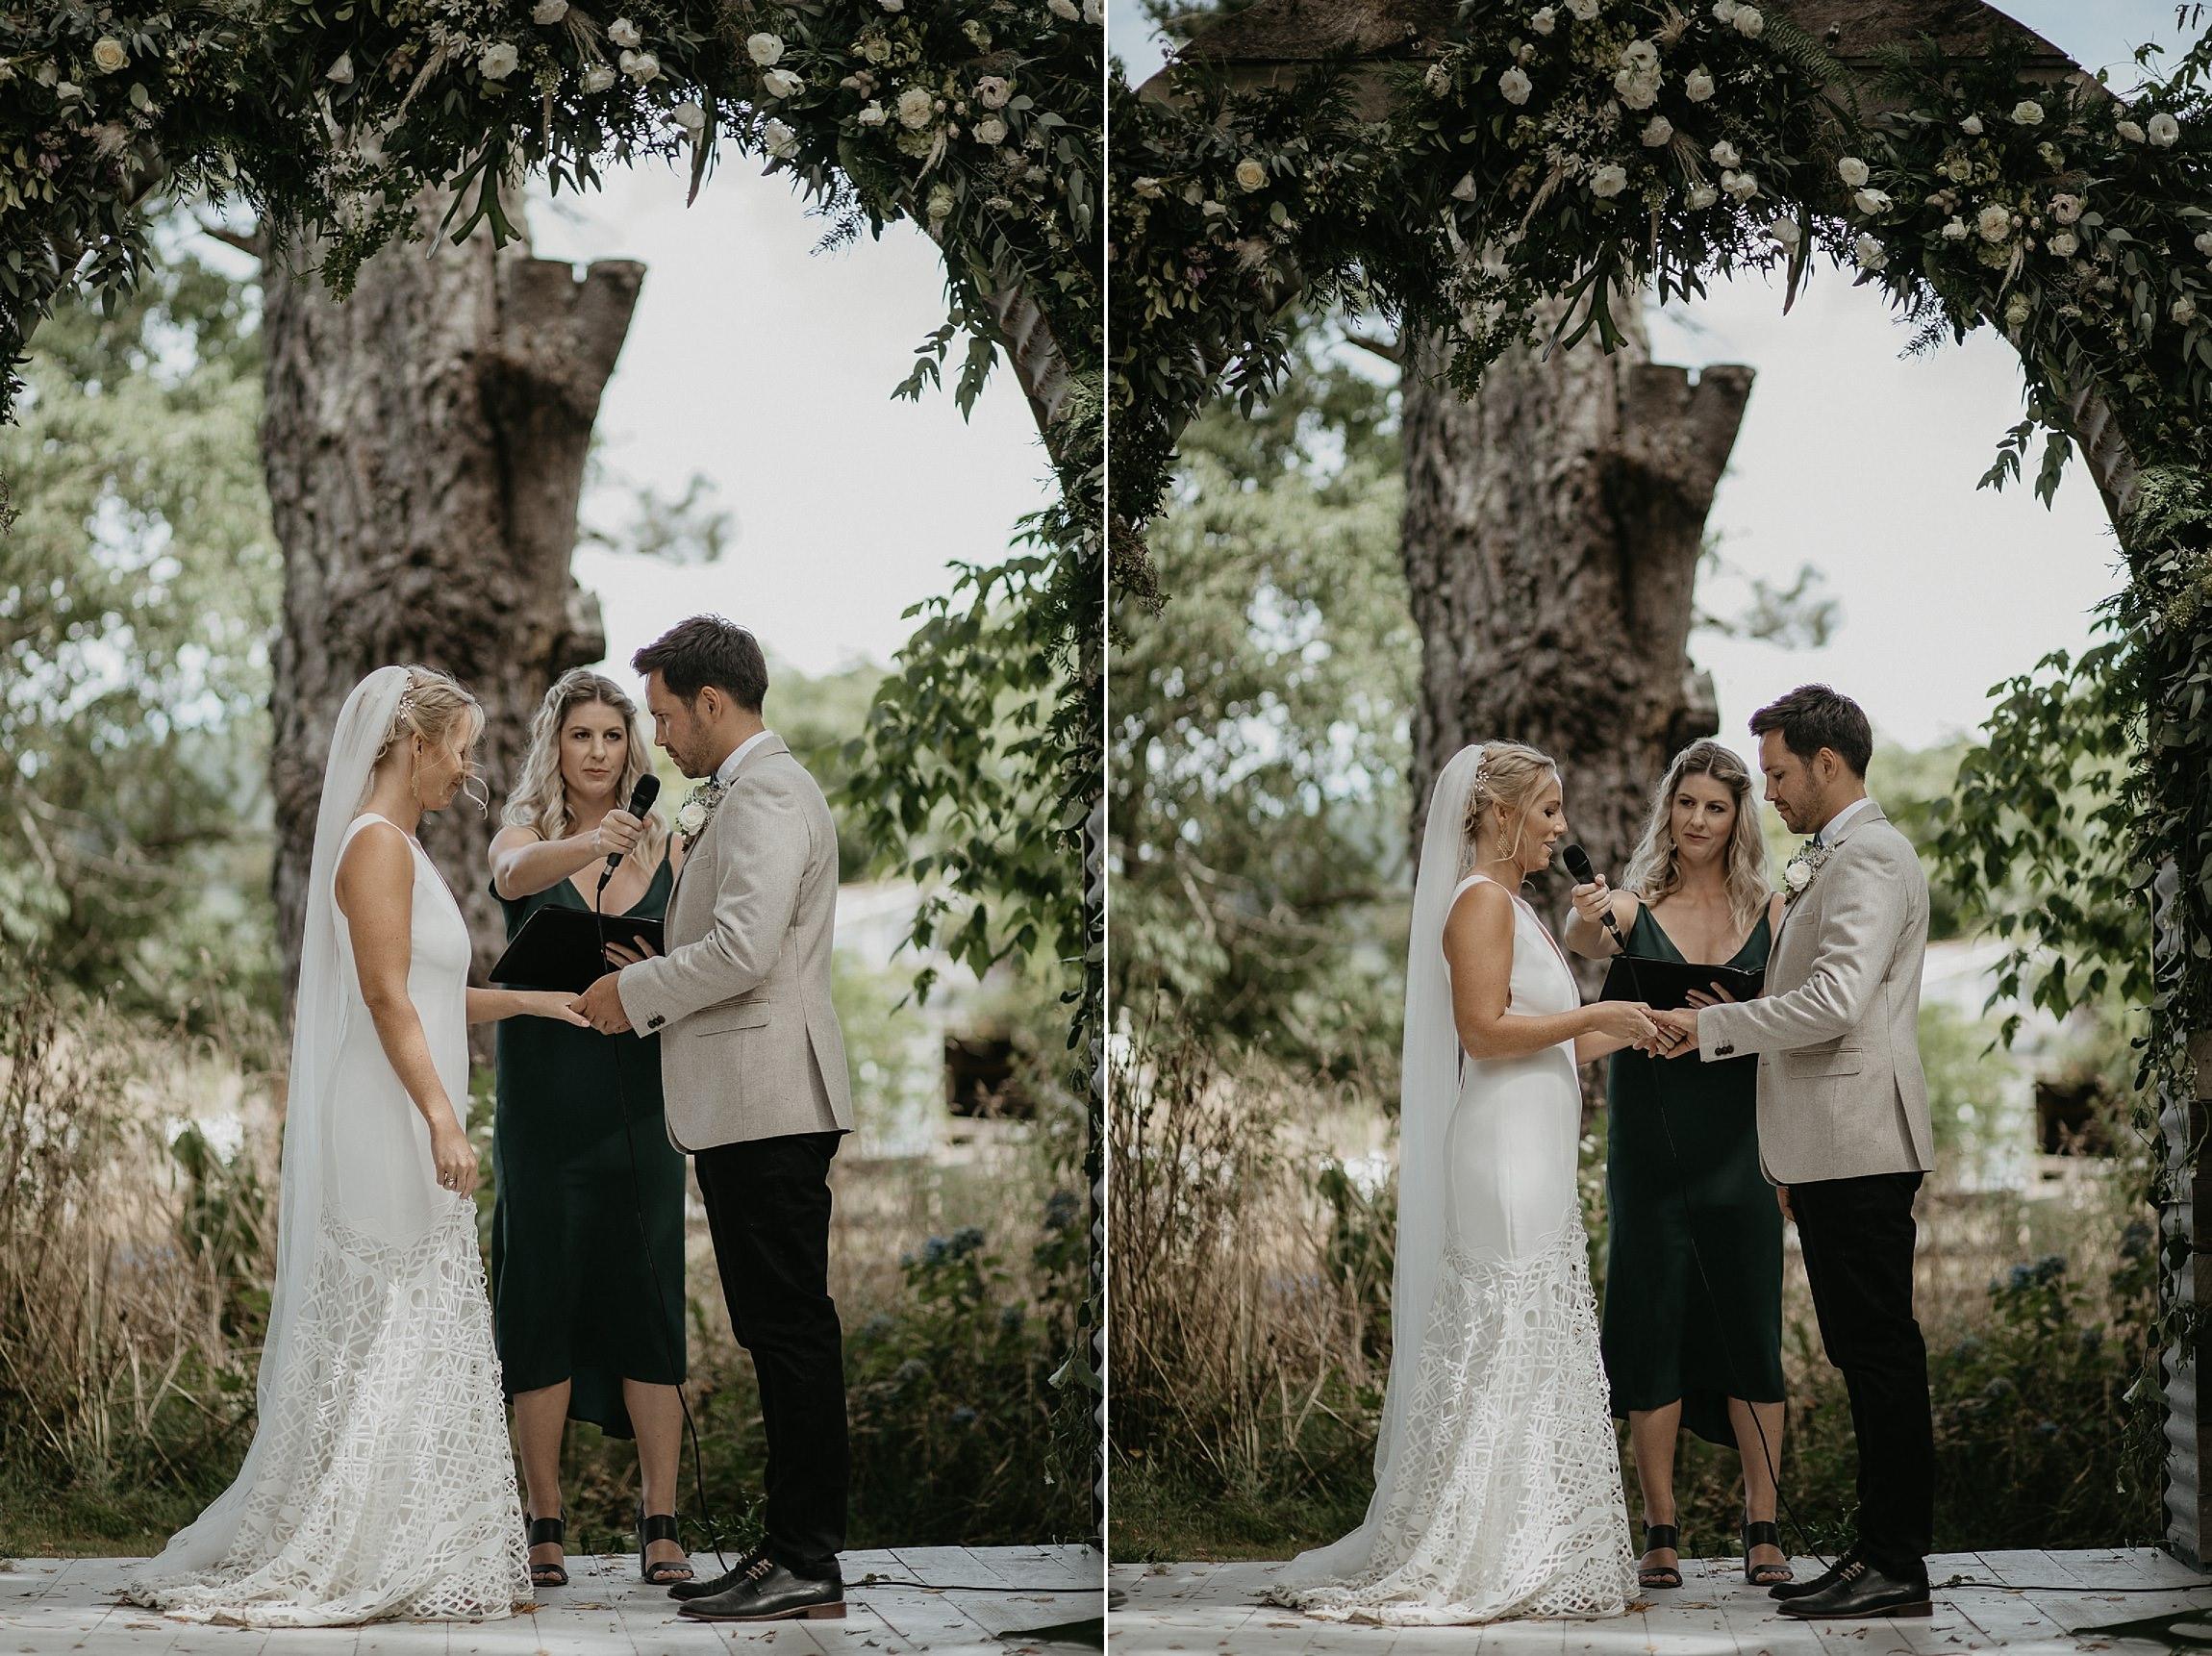 oldforestschool-wedding-blog-107.jpg